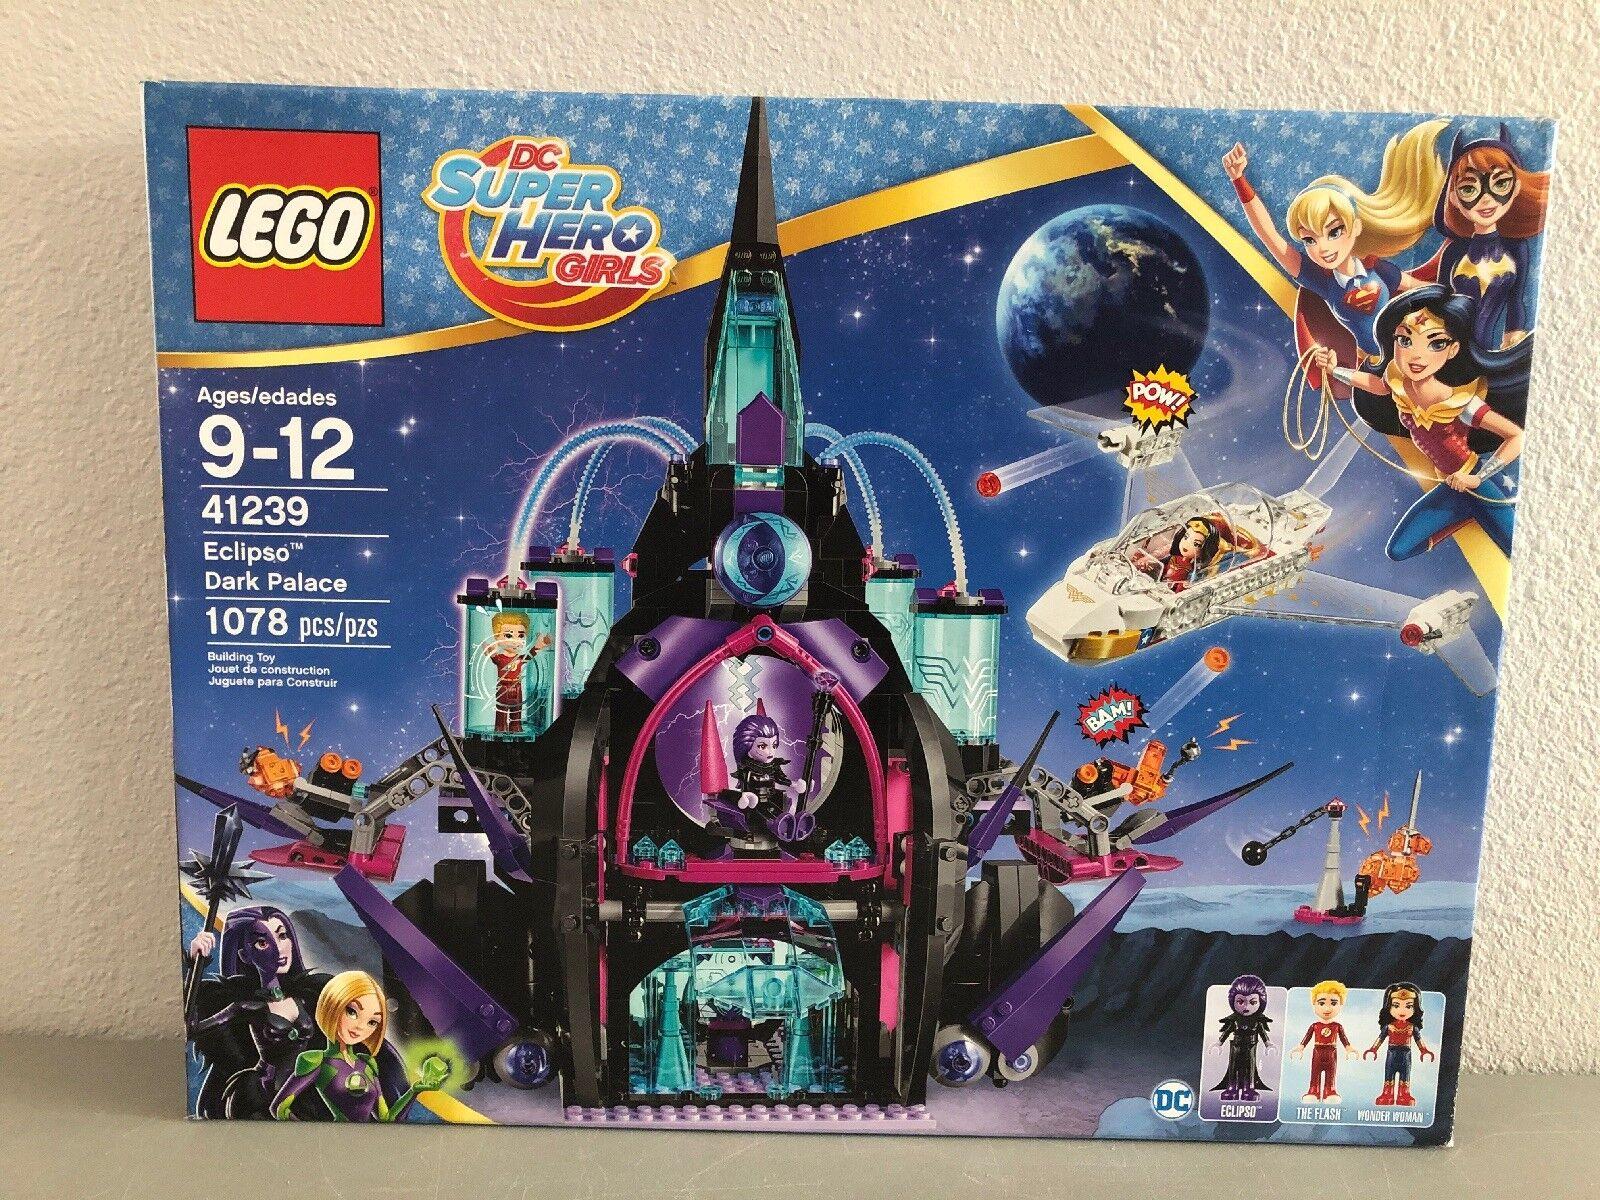 LEGO DC Super Hero Girls Eclipso Dark Palace 41239 - Nuovo in Sealed Box